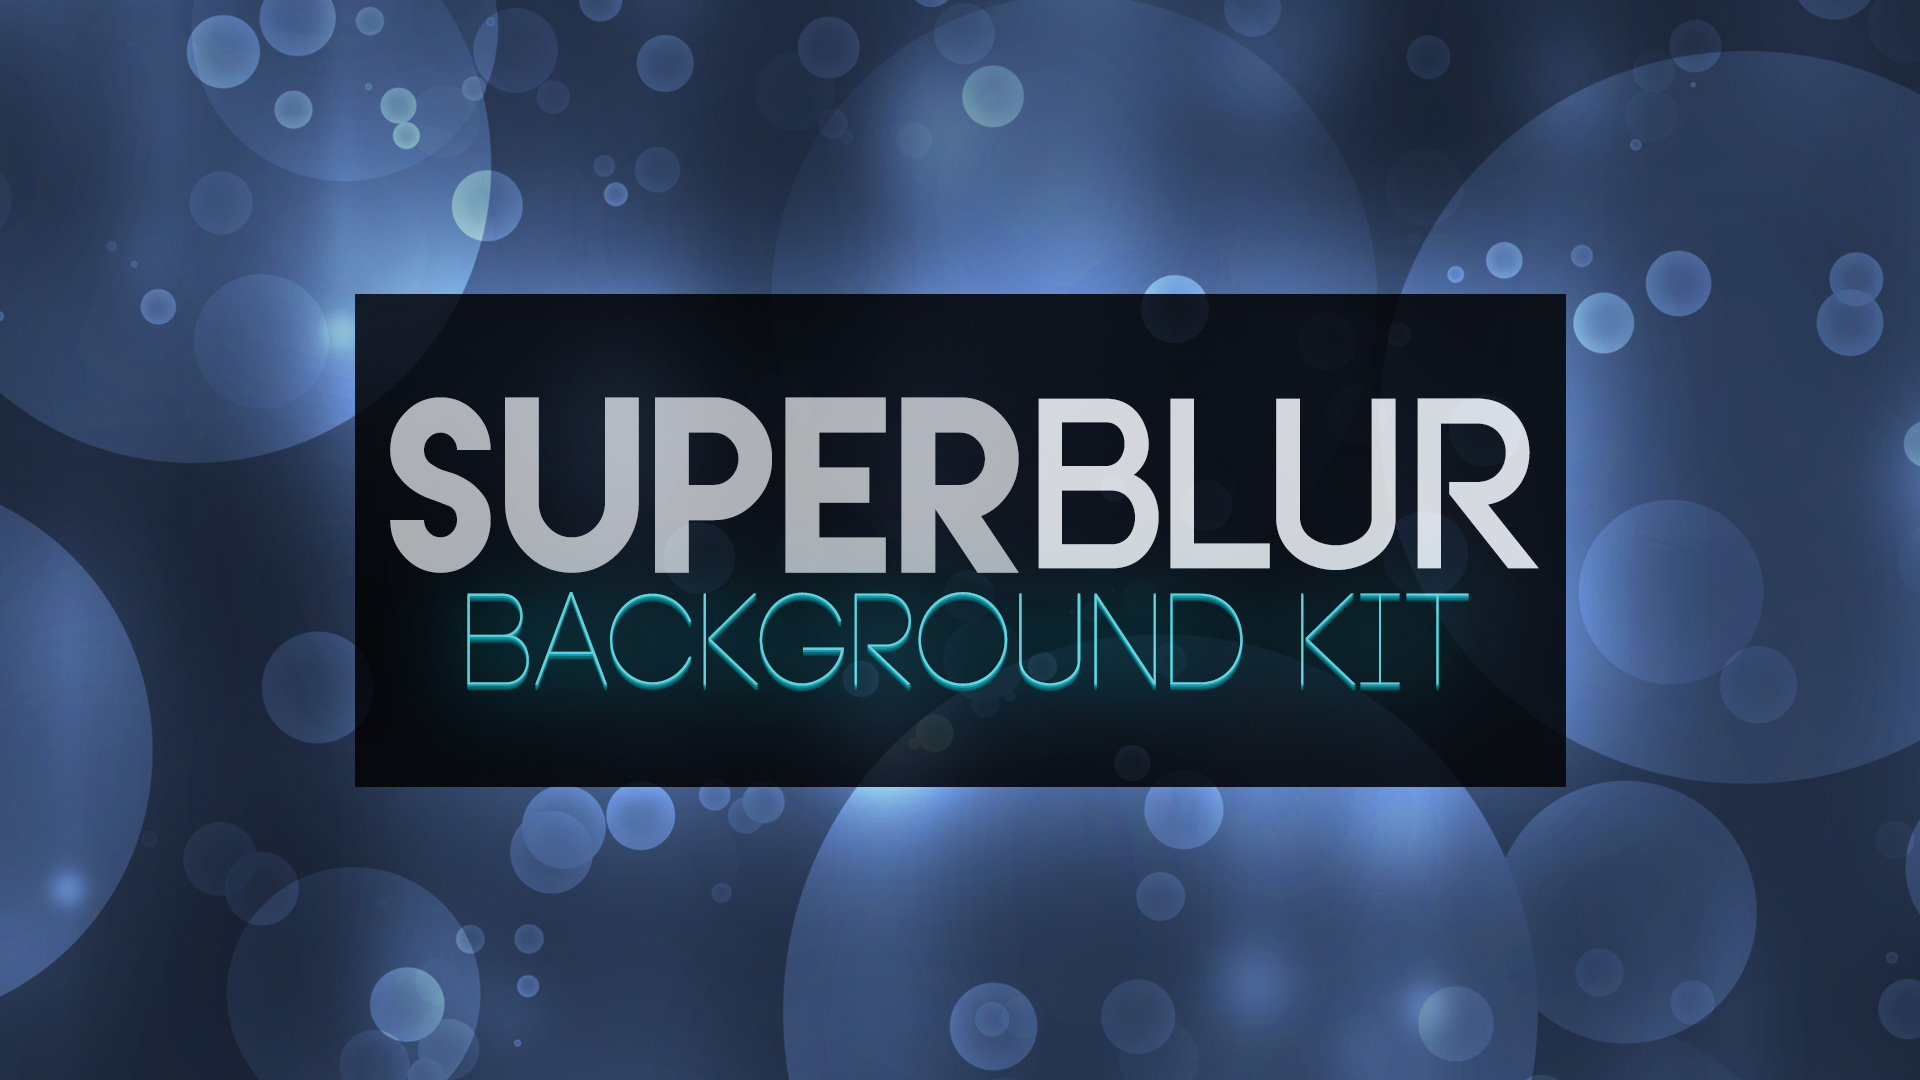 SuperBlur Background Kit